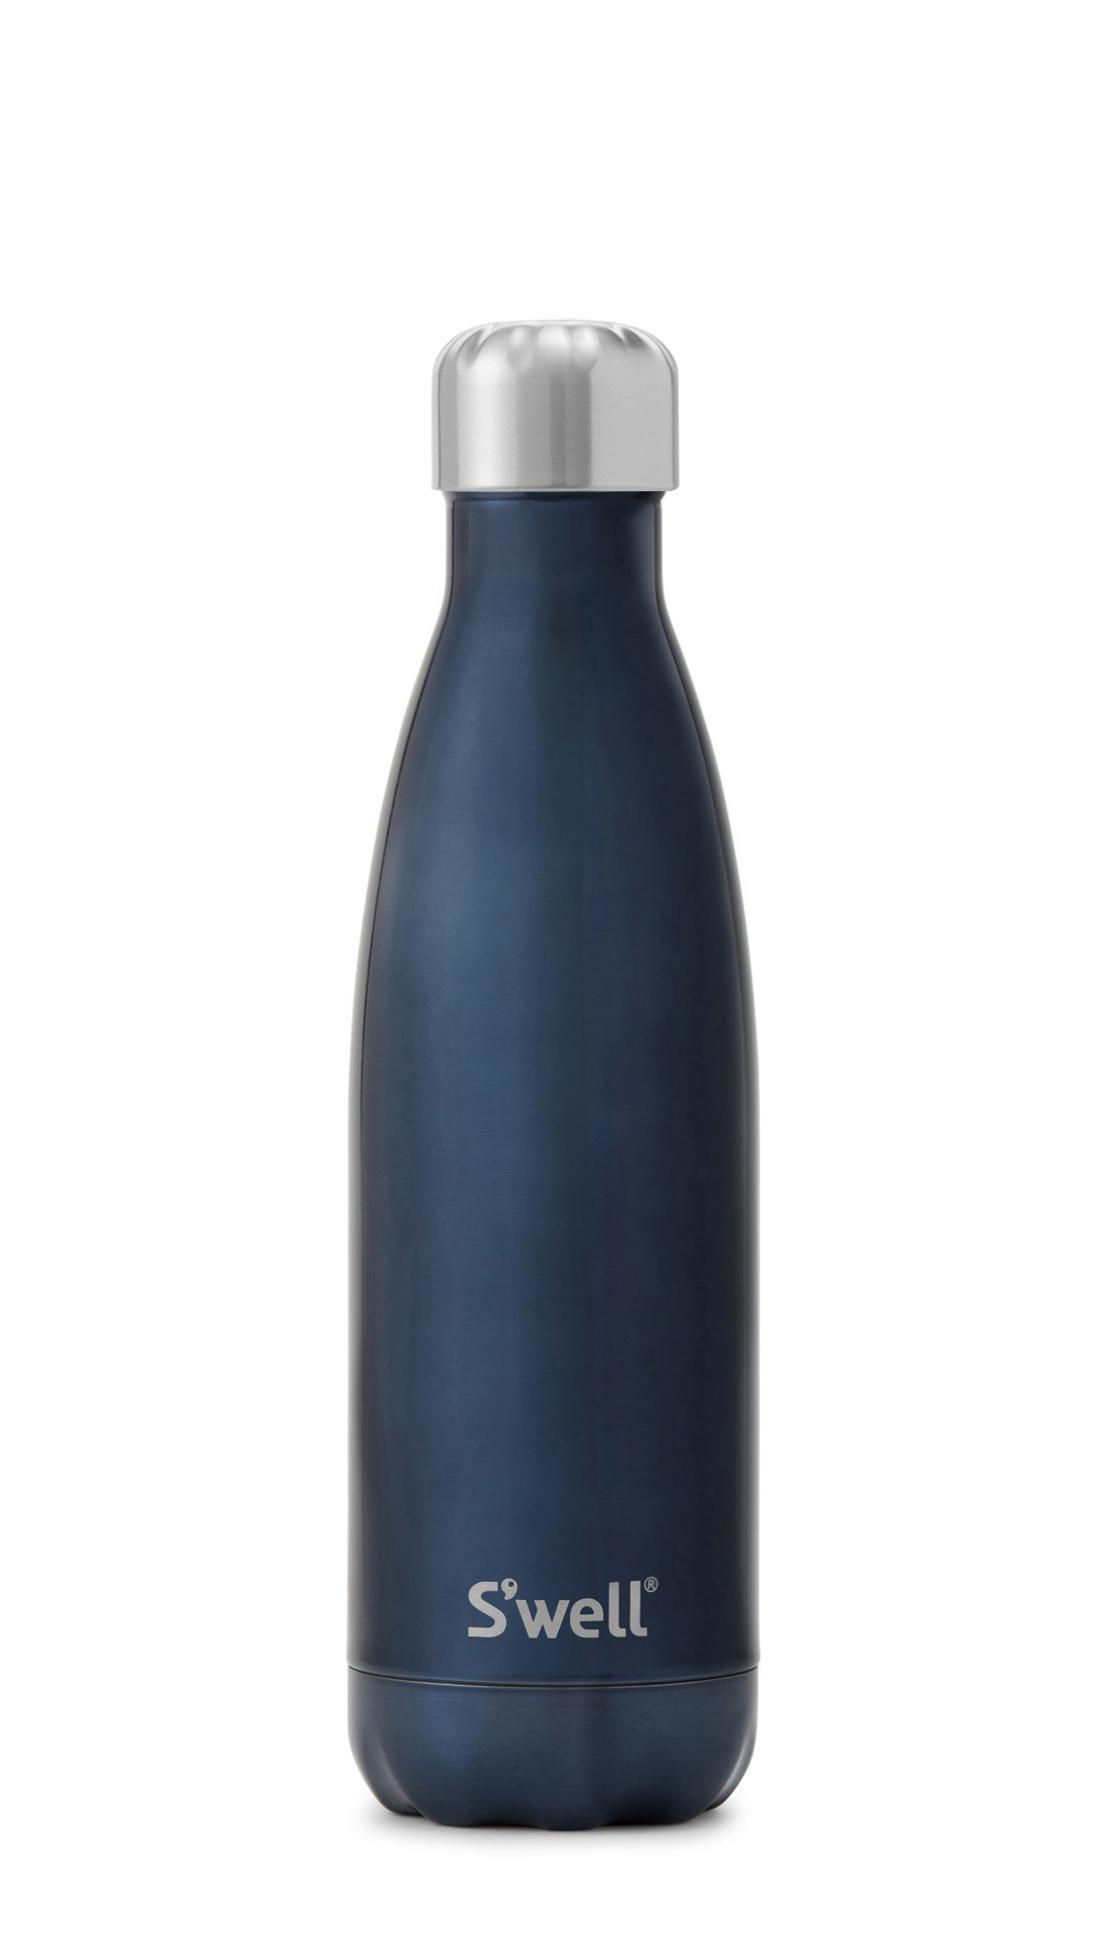 S'well Bottle Trinkflasche Blue Suede 500ml (17...